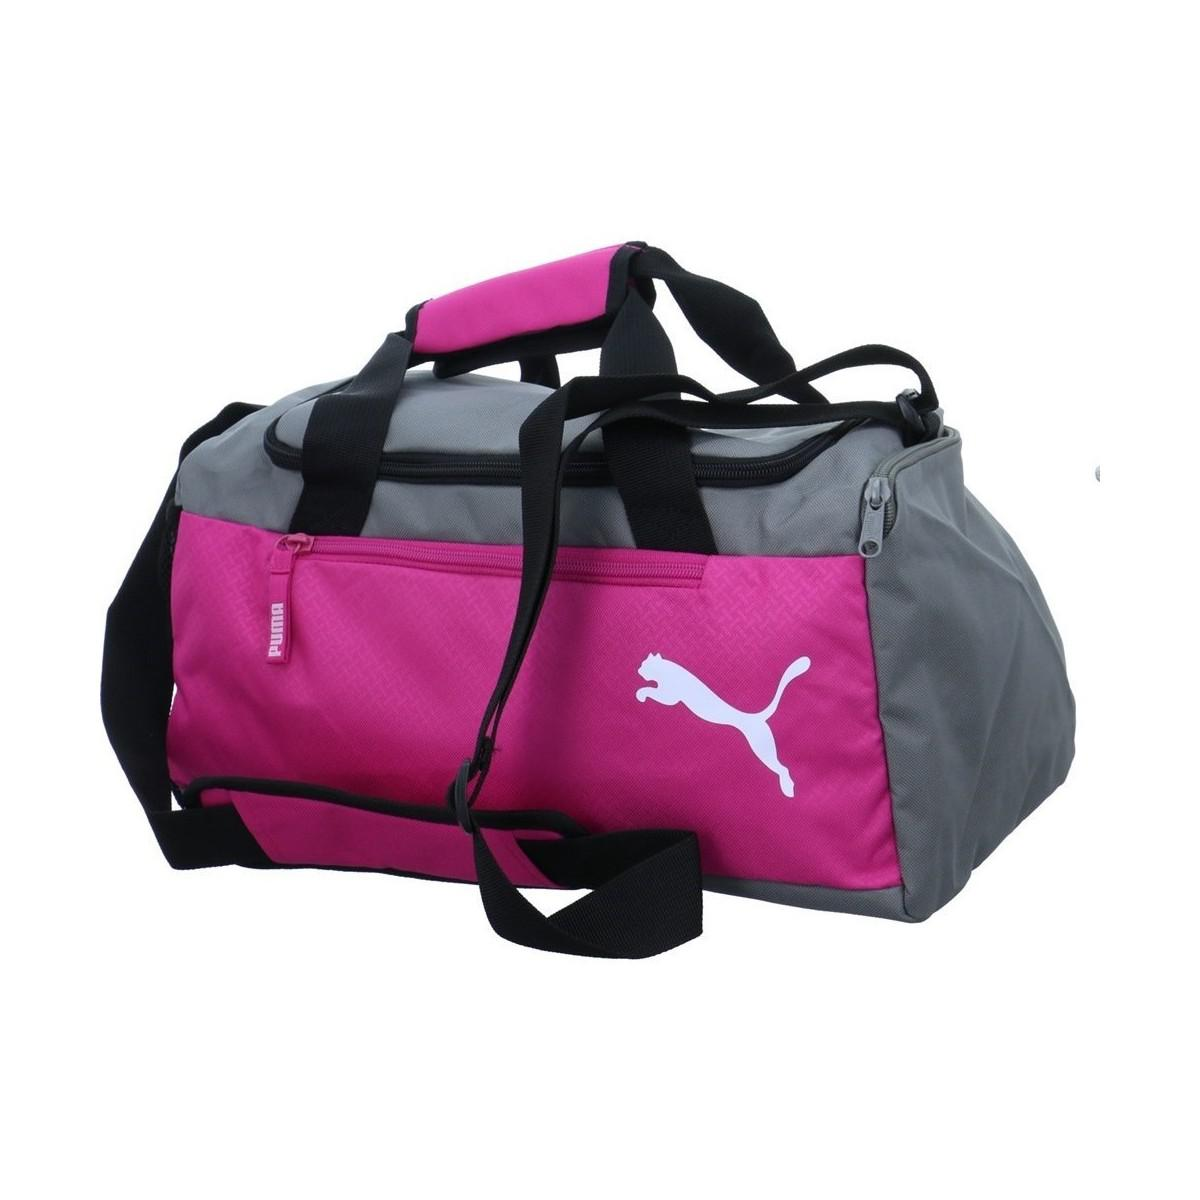 ddfe04bb32 PUMA Fundamentals Sports Bag Women s Sports Bag In Grey in Gray for ...